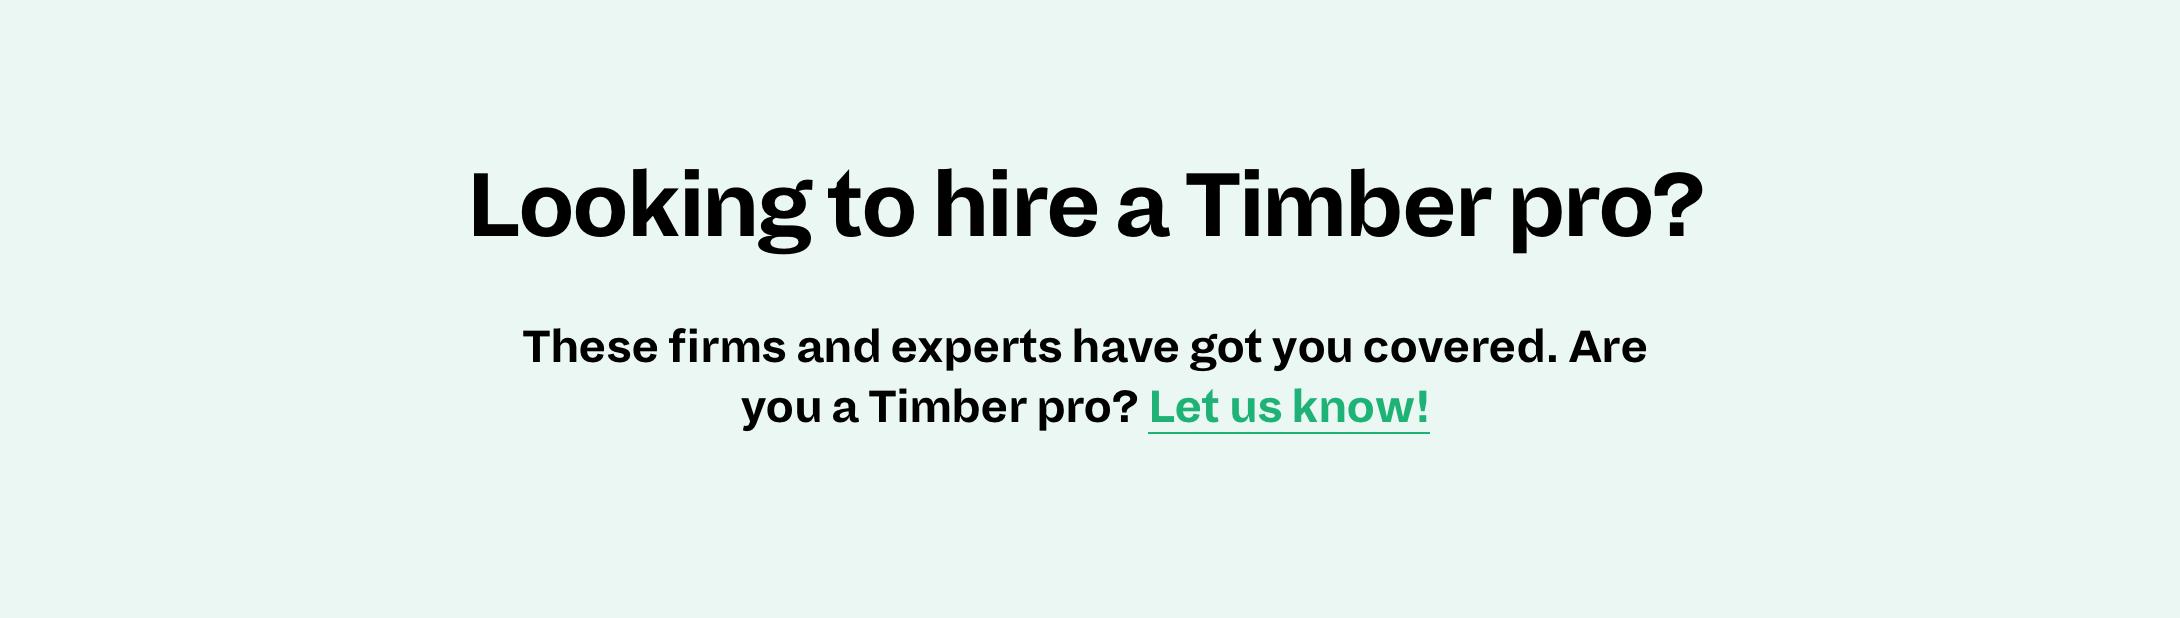 timber-pro-pixels